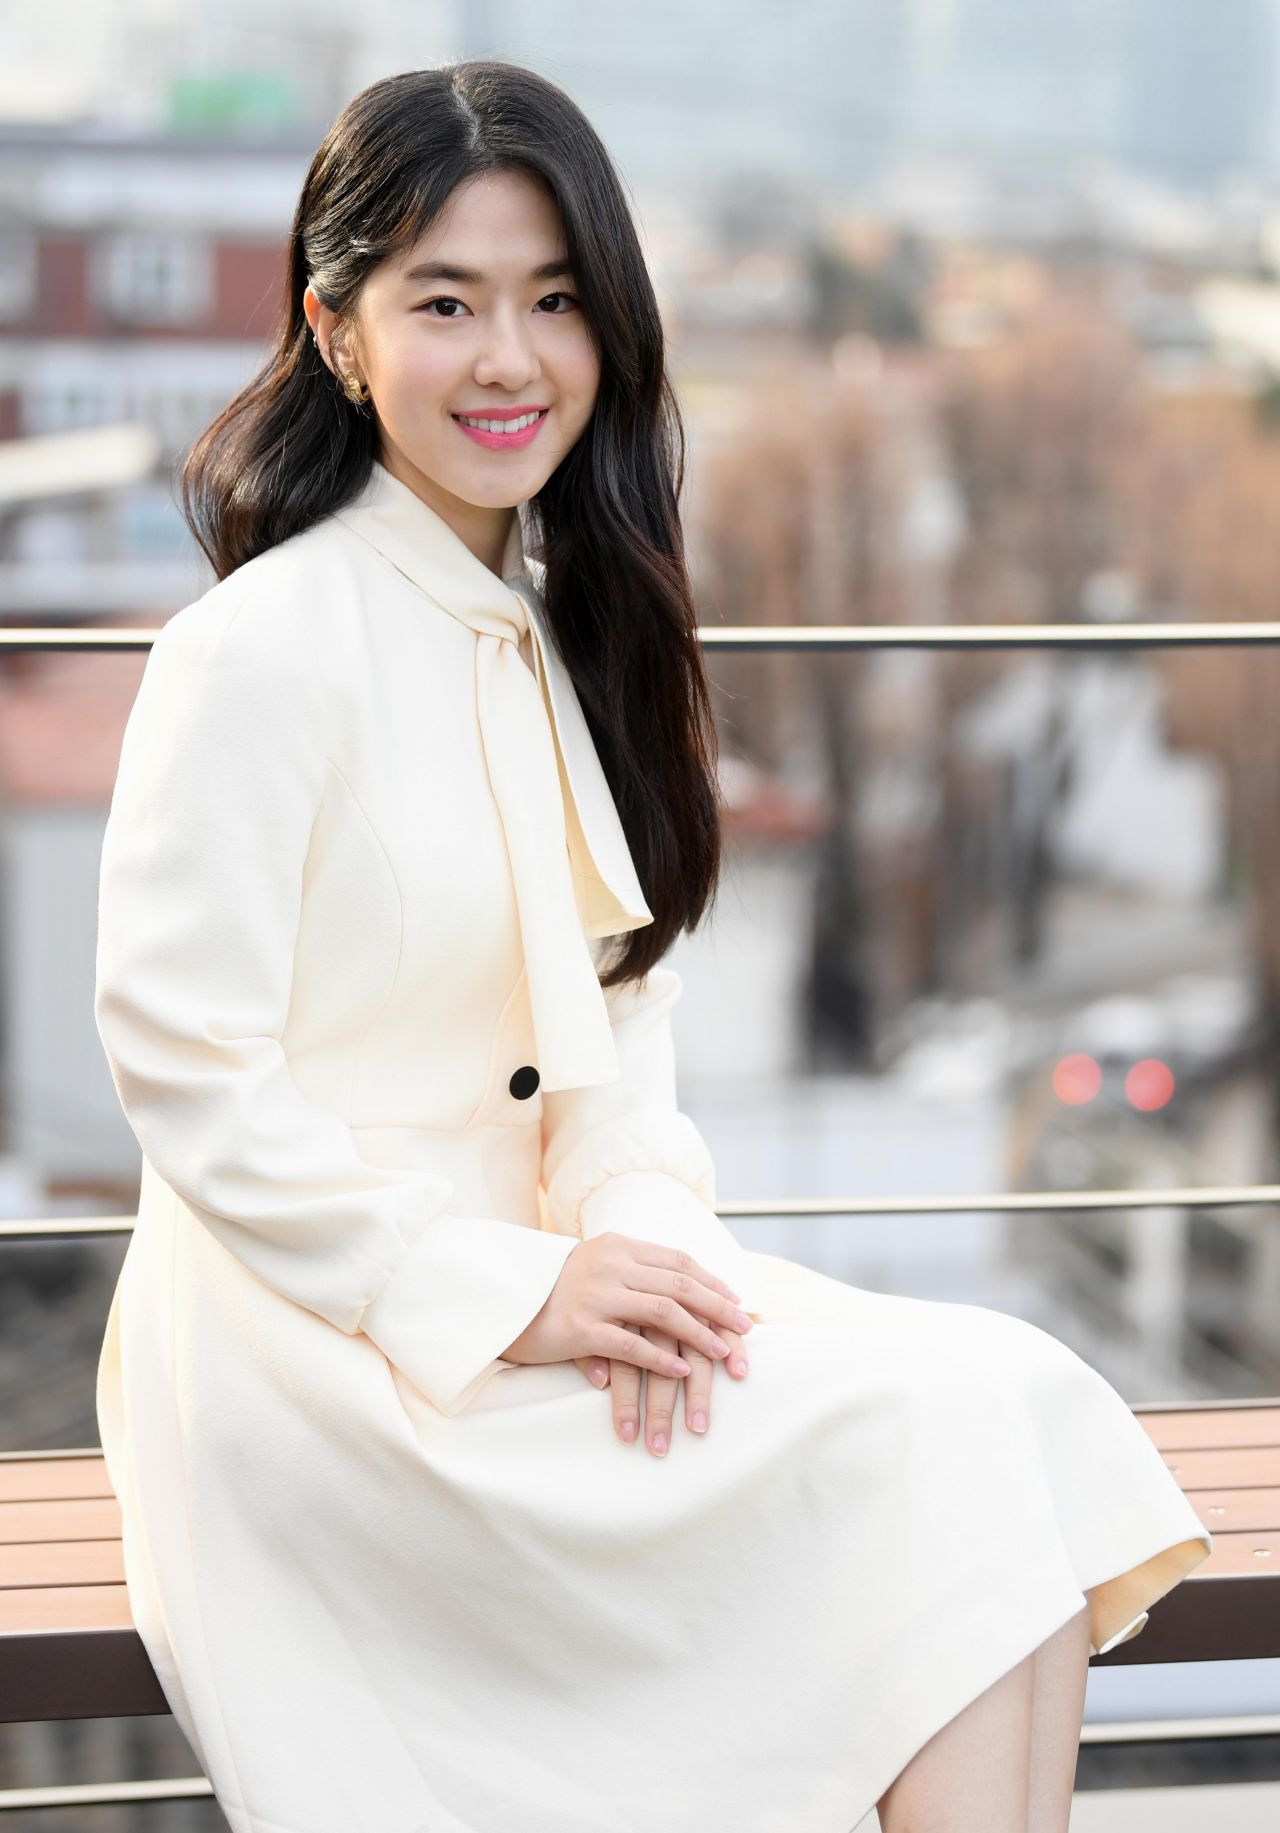 Park Hye Soo Style Clothes Outfits And Fashion Celebmafia